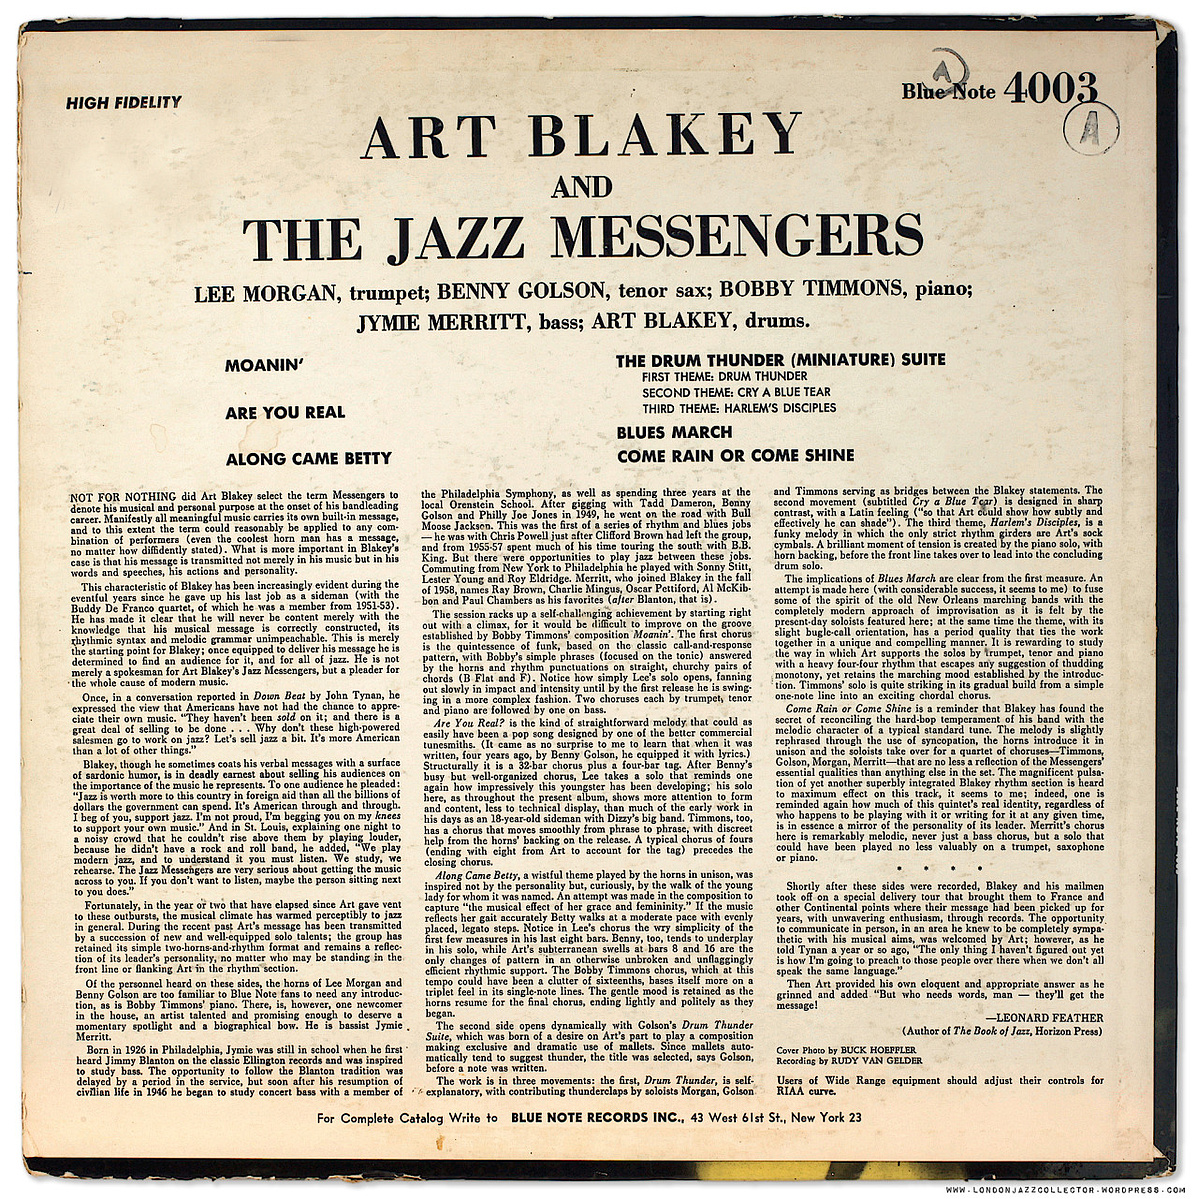 jazzinterju-120140.jpg